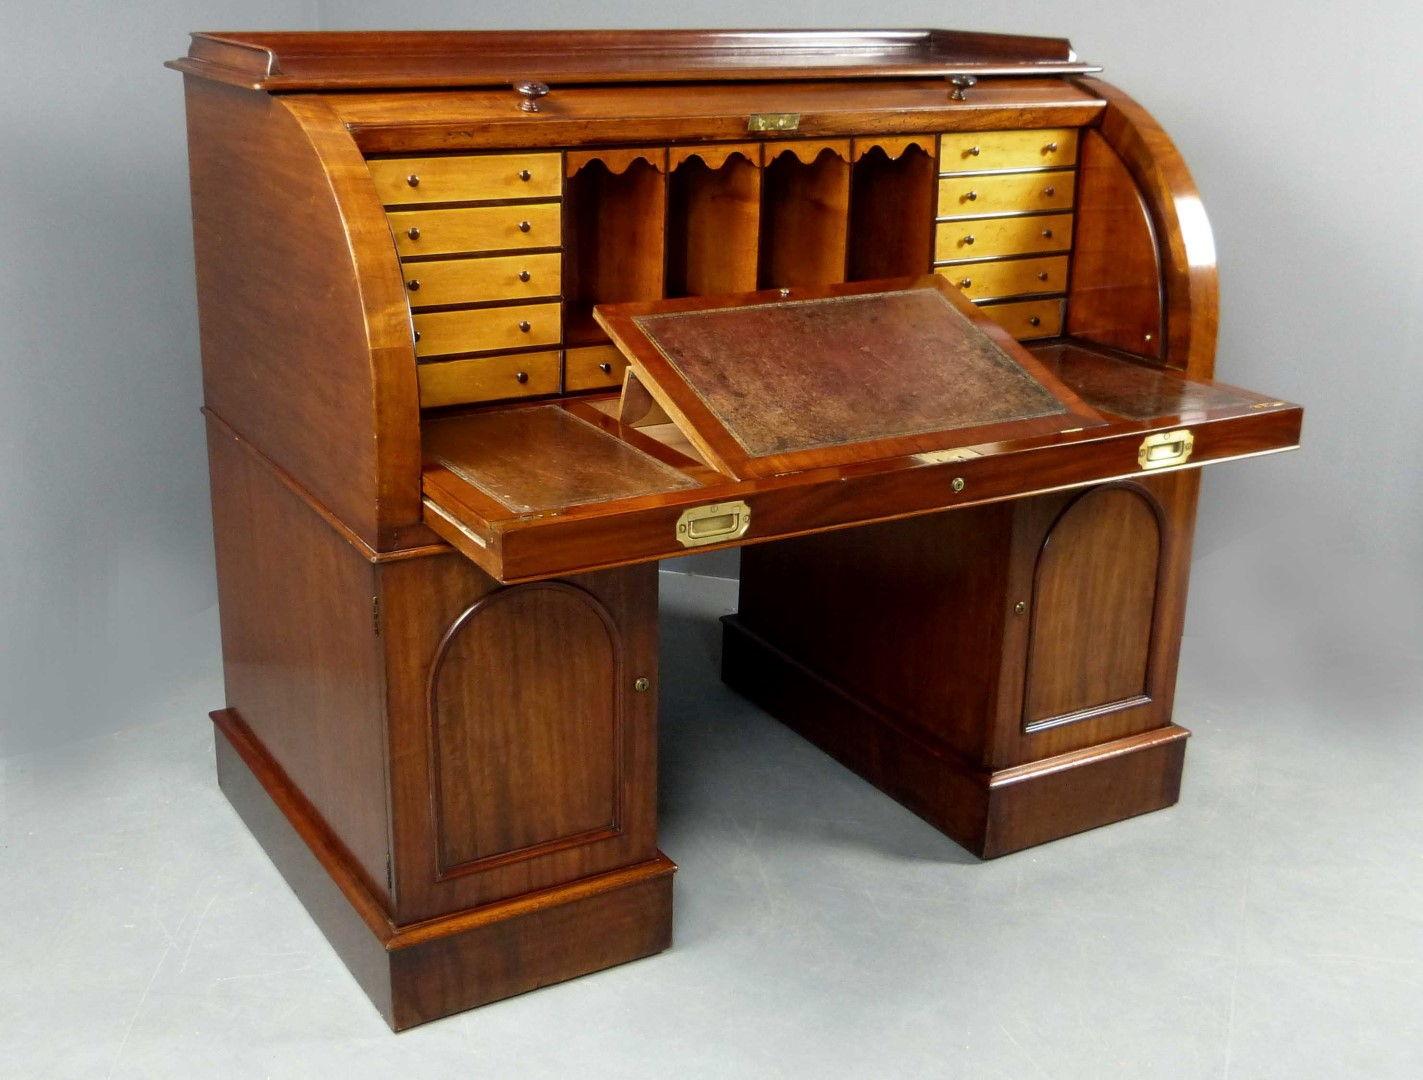 Antique furniture antique cupboards antique tables for Antique furniture desk